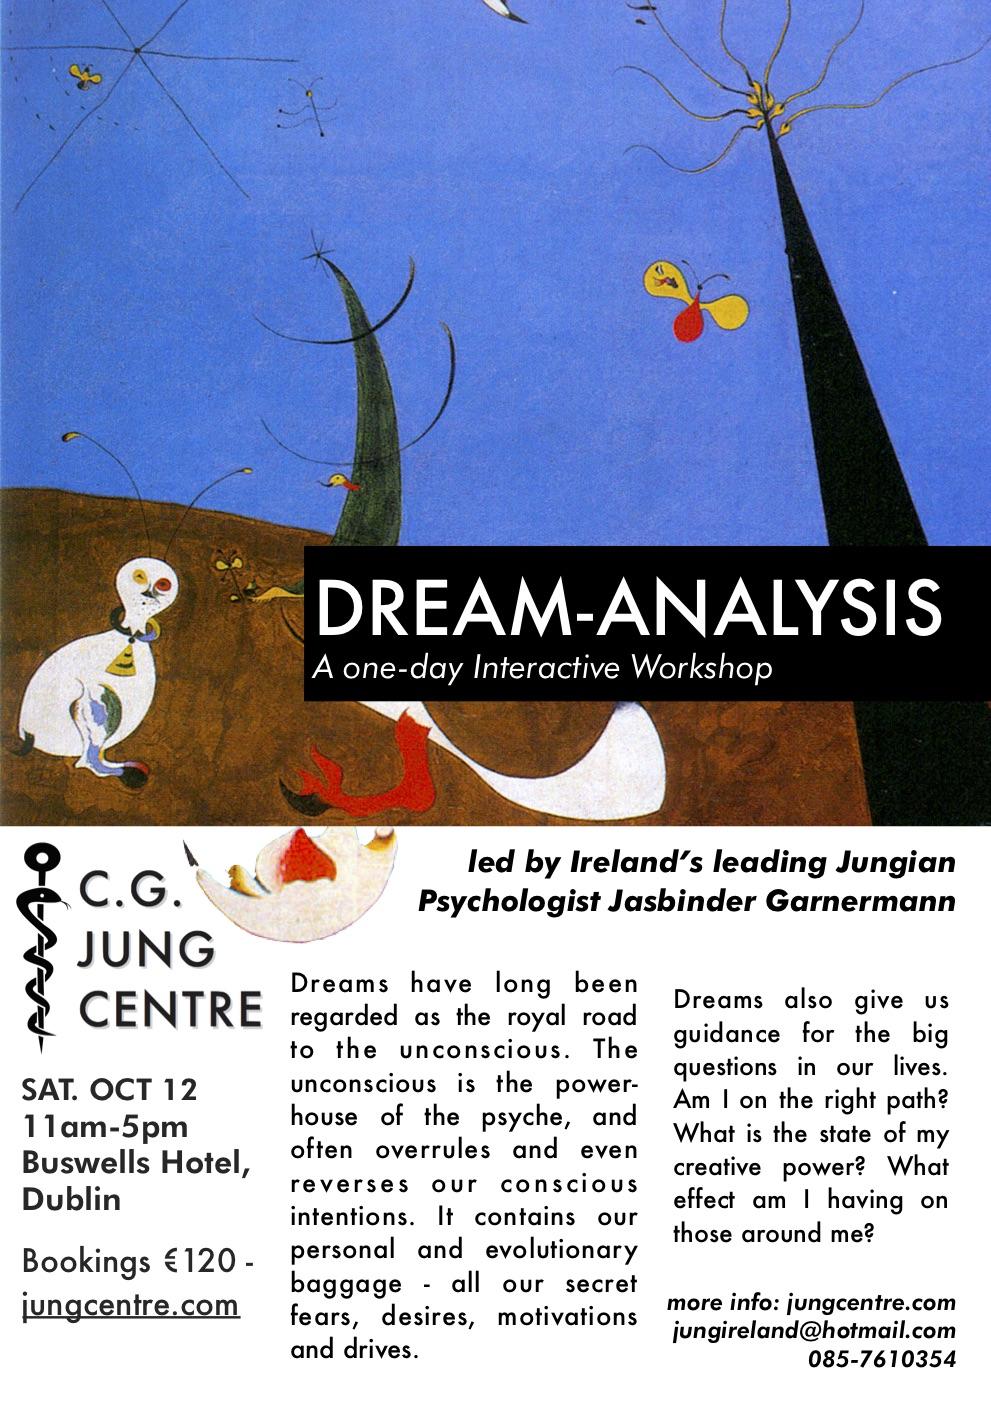 Dream-analysis sep 14 2019 web.jpg